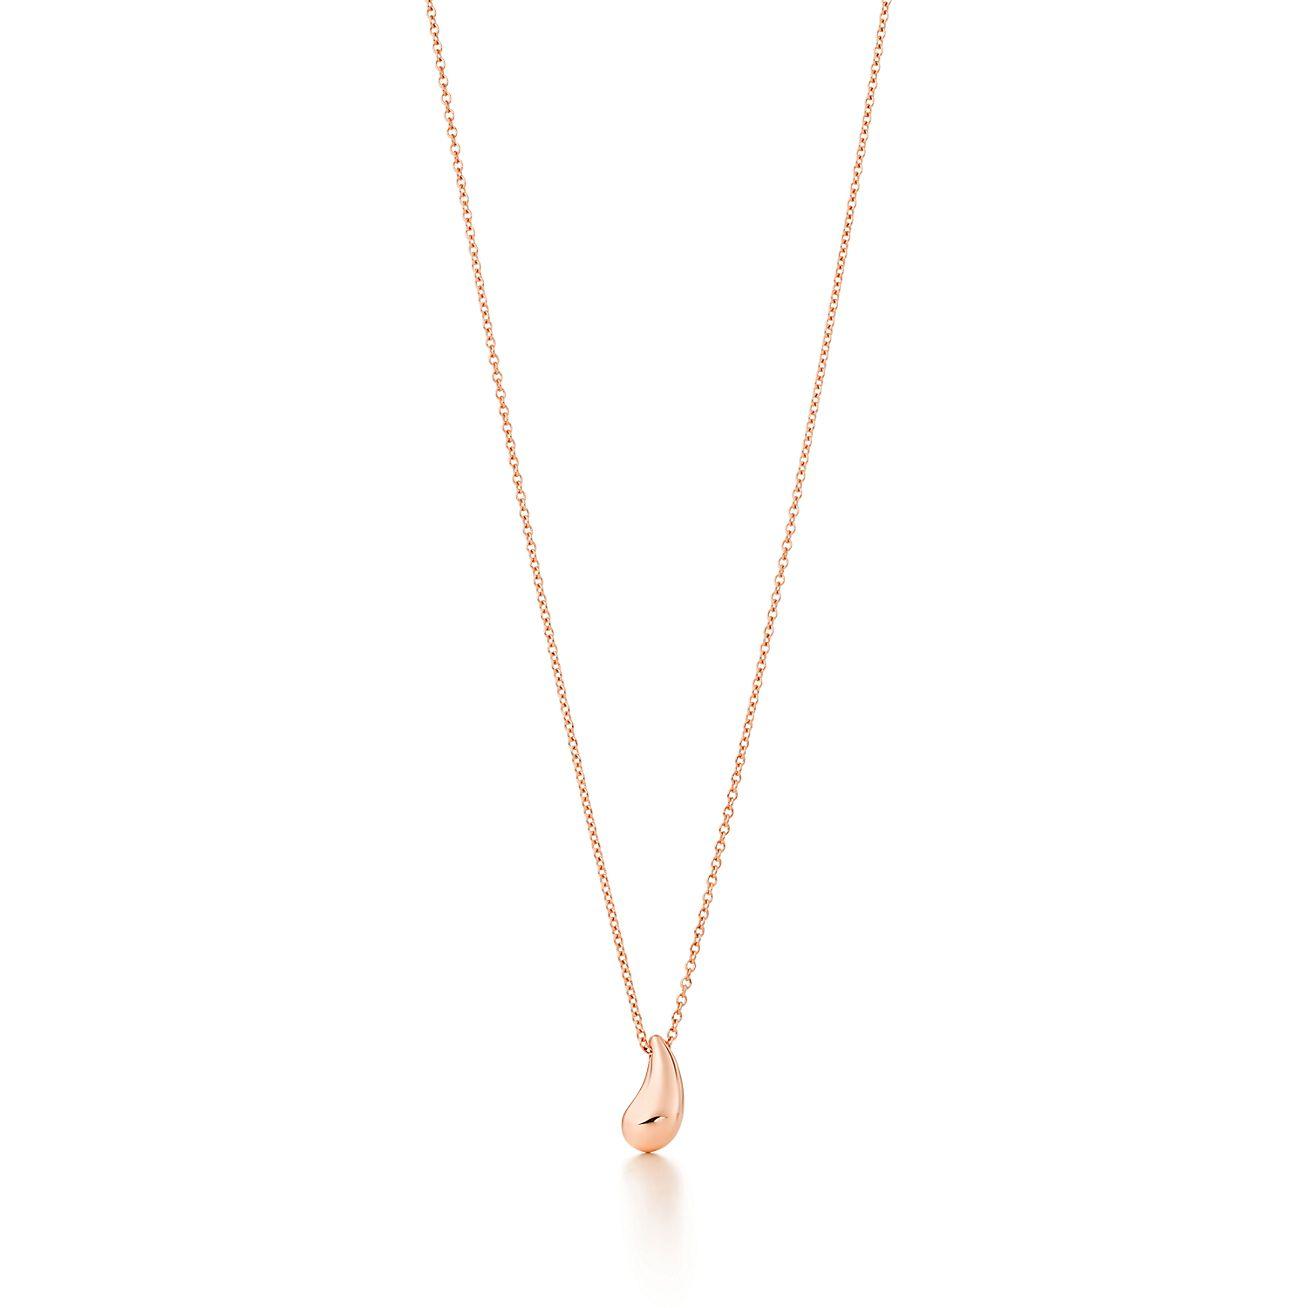 Elsa Peretti® Teardrop pendant in 18k rose gold.  f870ce869